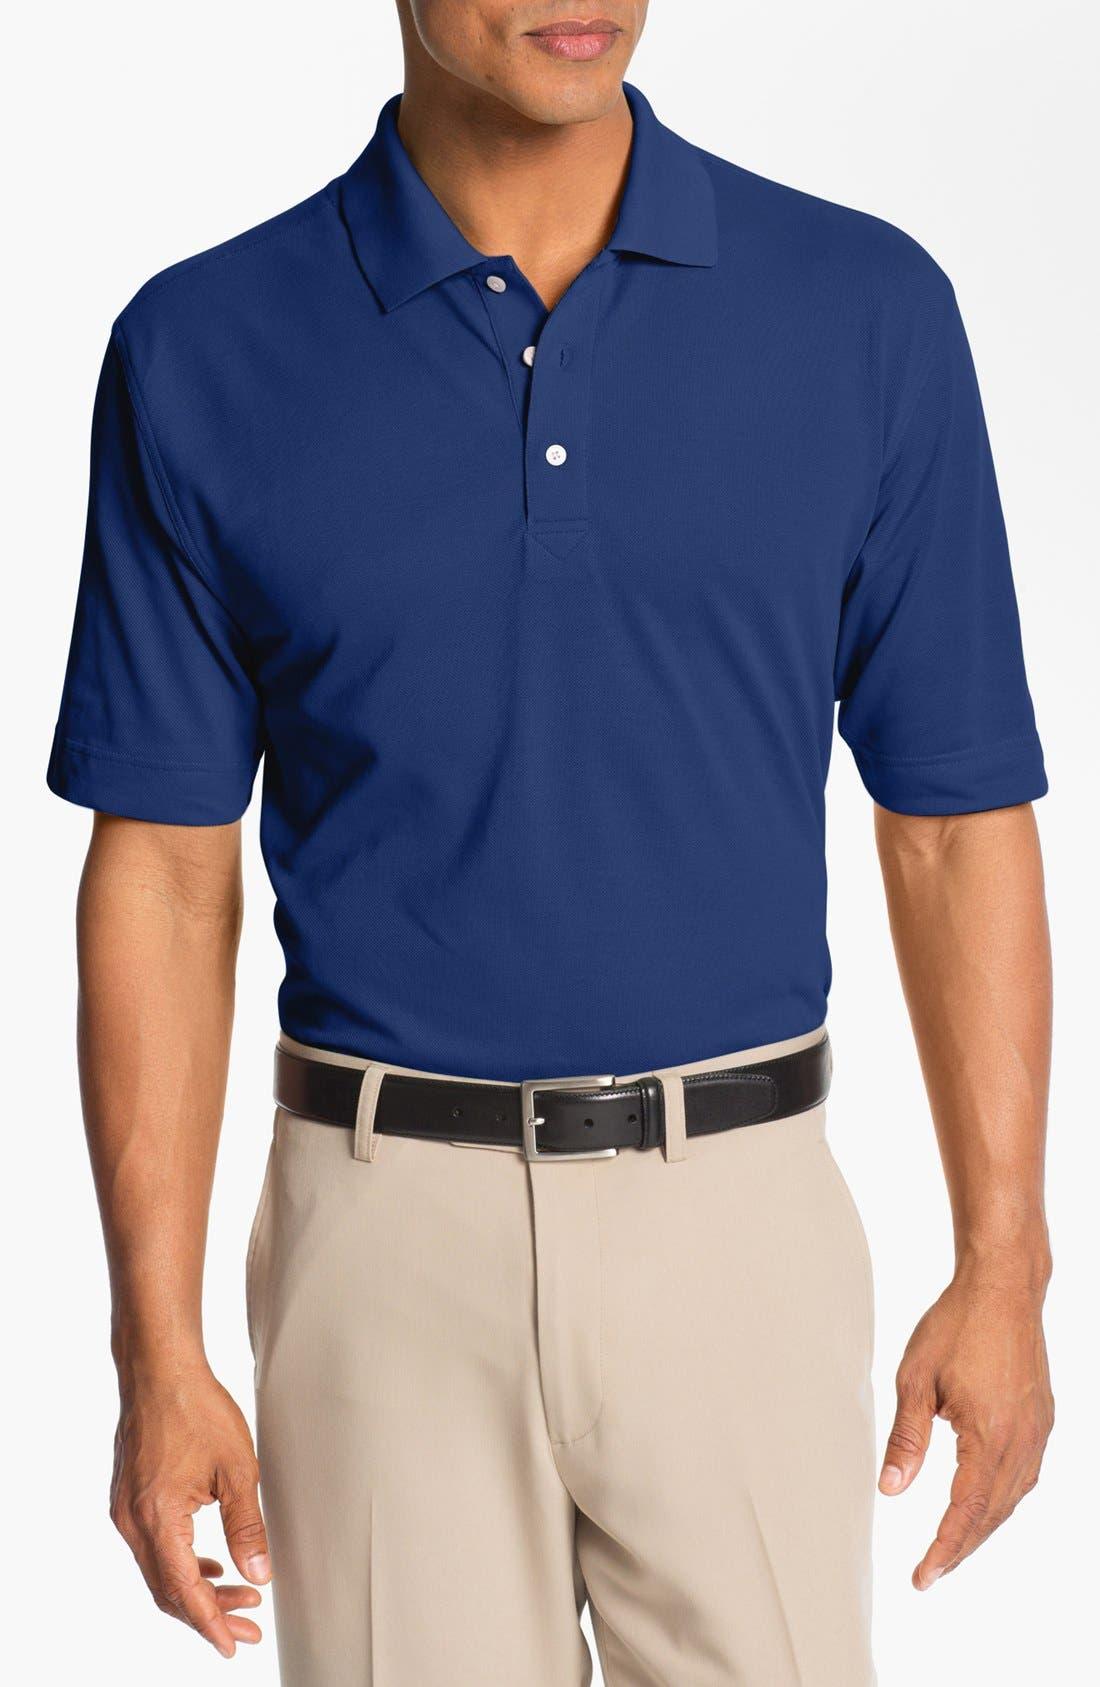 Cutter & Buck 'Championship' DryTec Golf Polo (Big & Tall)